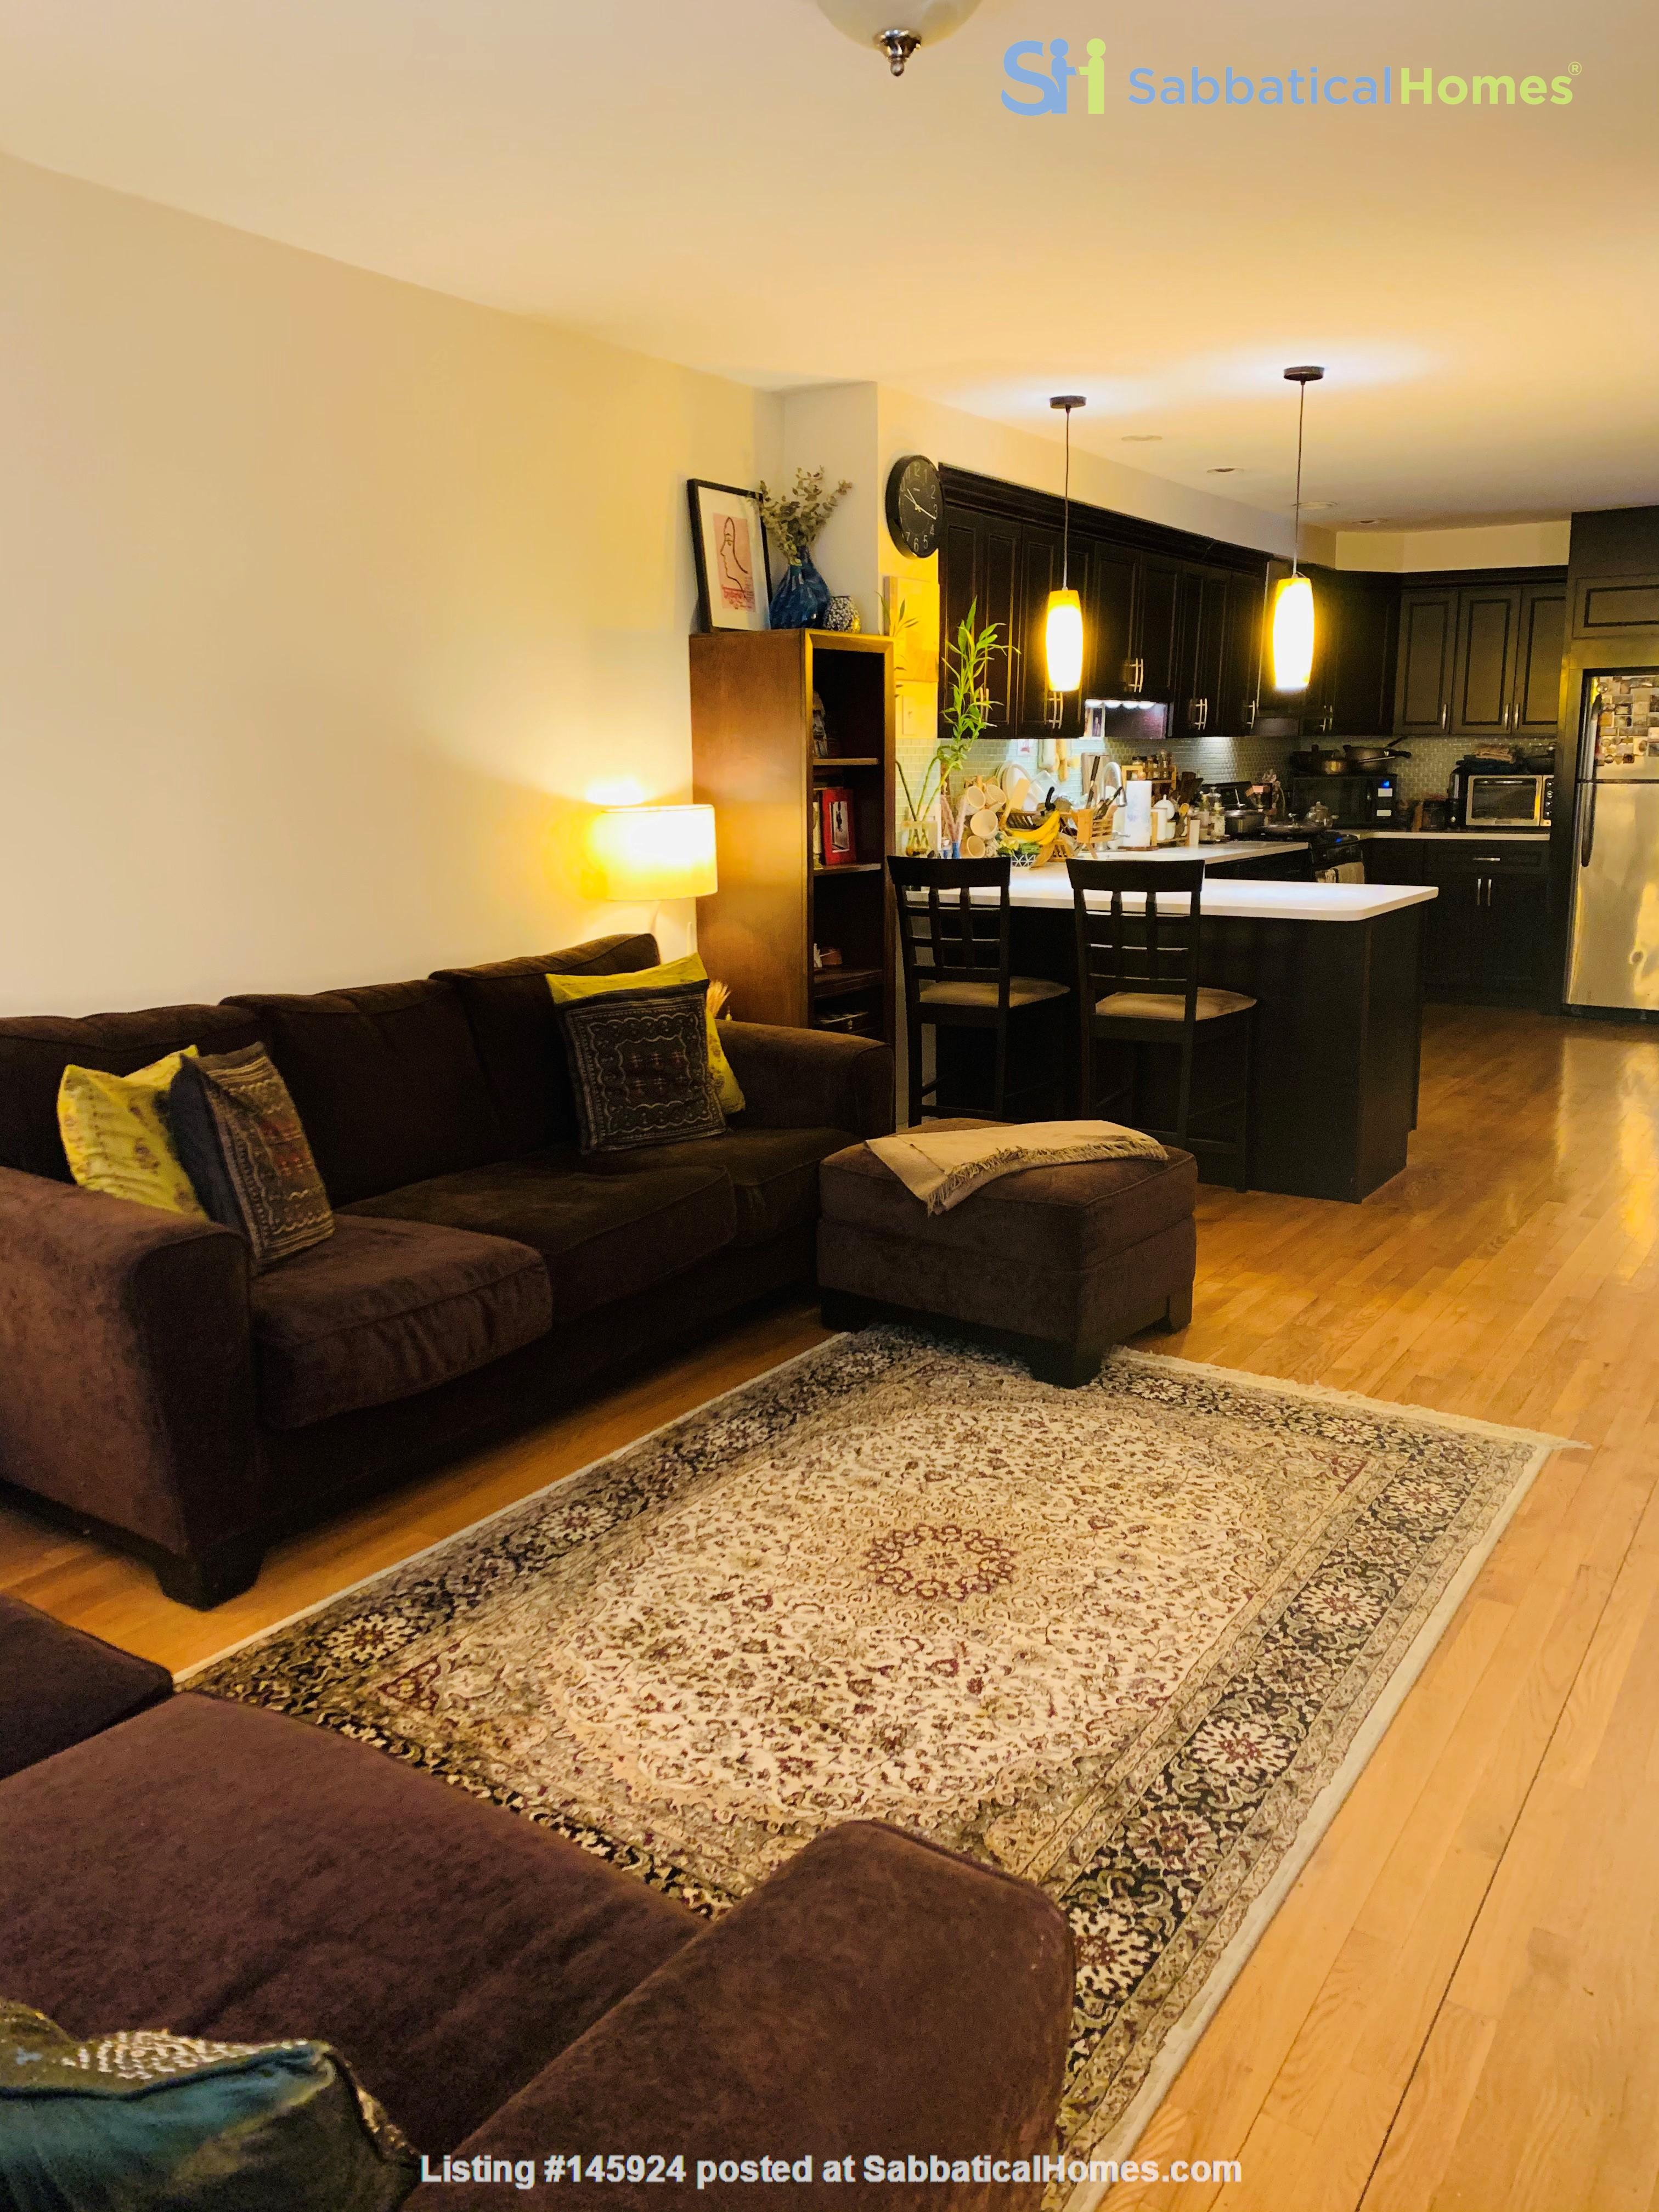 Modern, sunny, 2 bed 1 bath 1st floor unit with W+D, den & backyard garden Home Rental in Cambridge 0